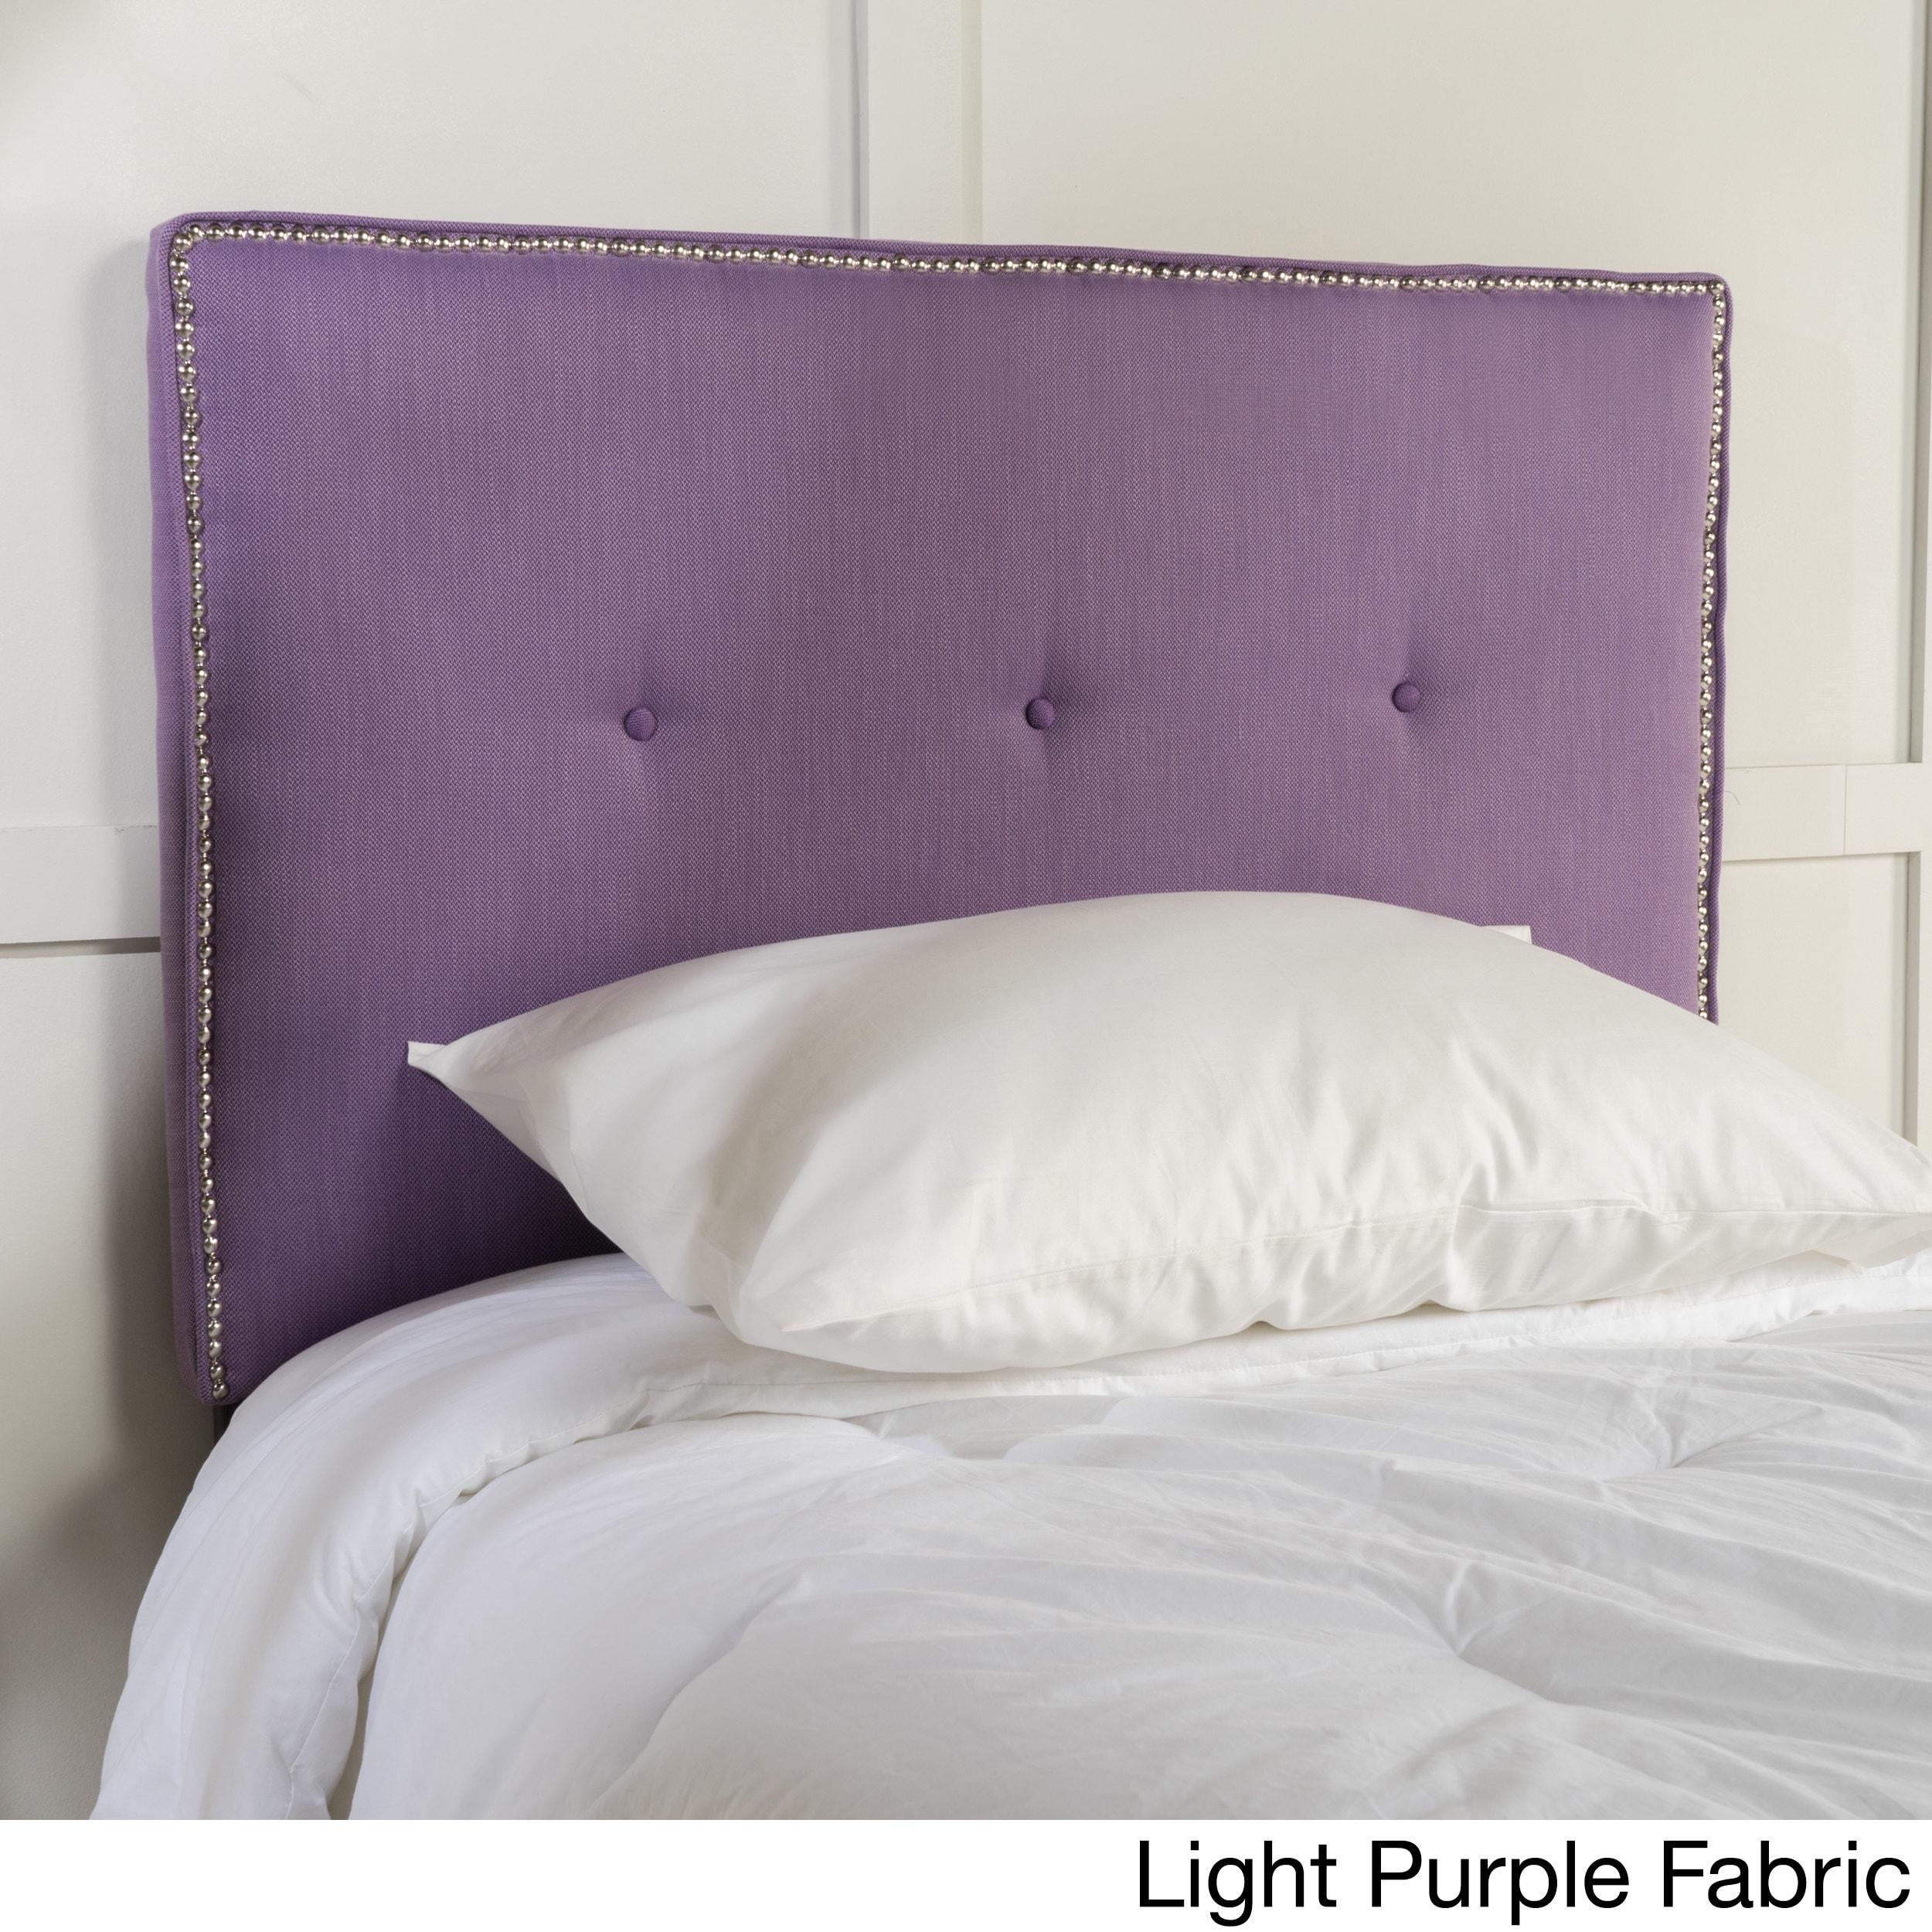 Buy Purple Headboards Online at Overstockcom